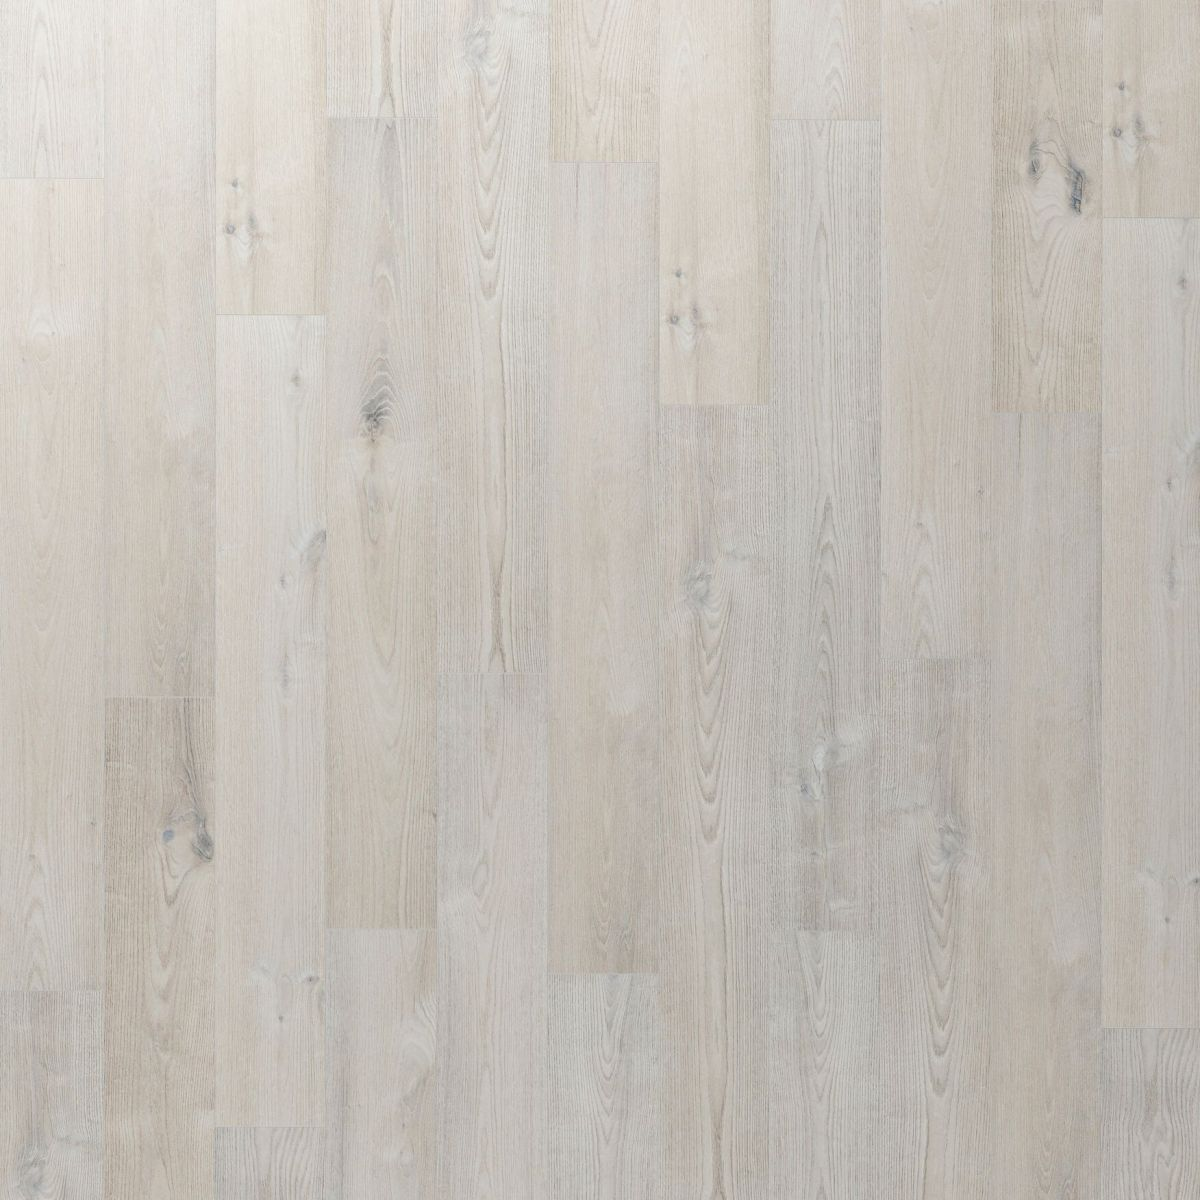 Avatara vloerdelen hout K03 plan